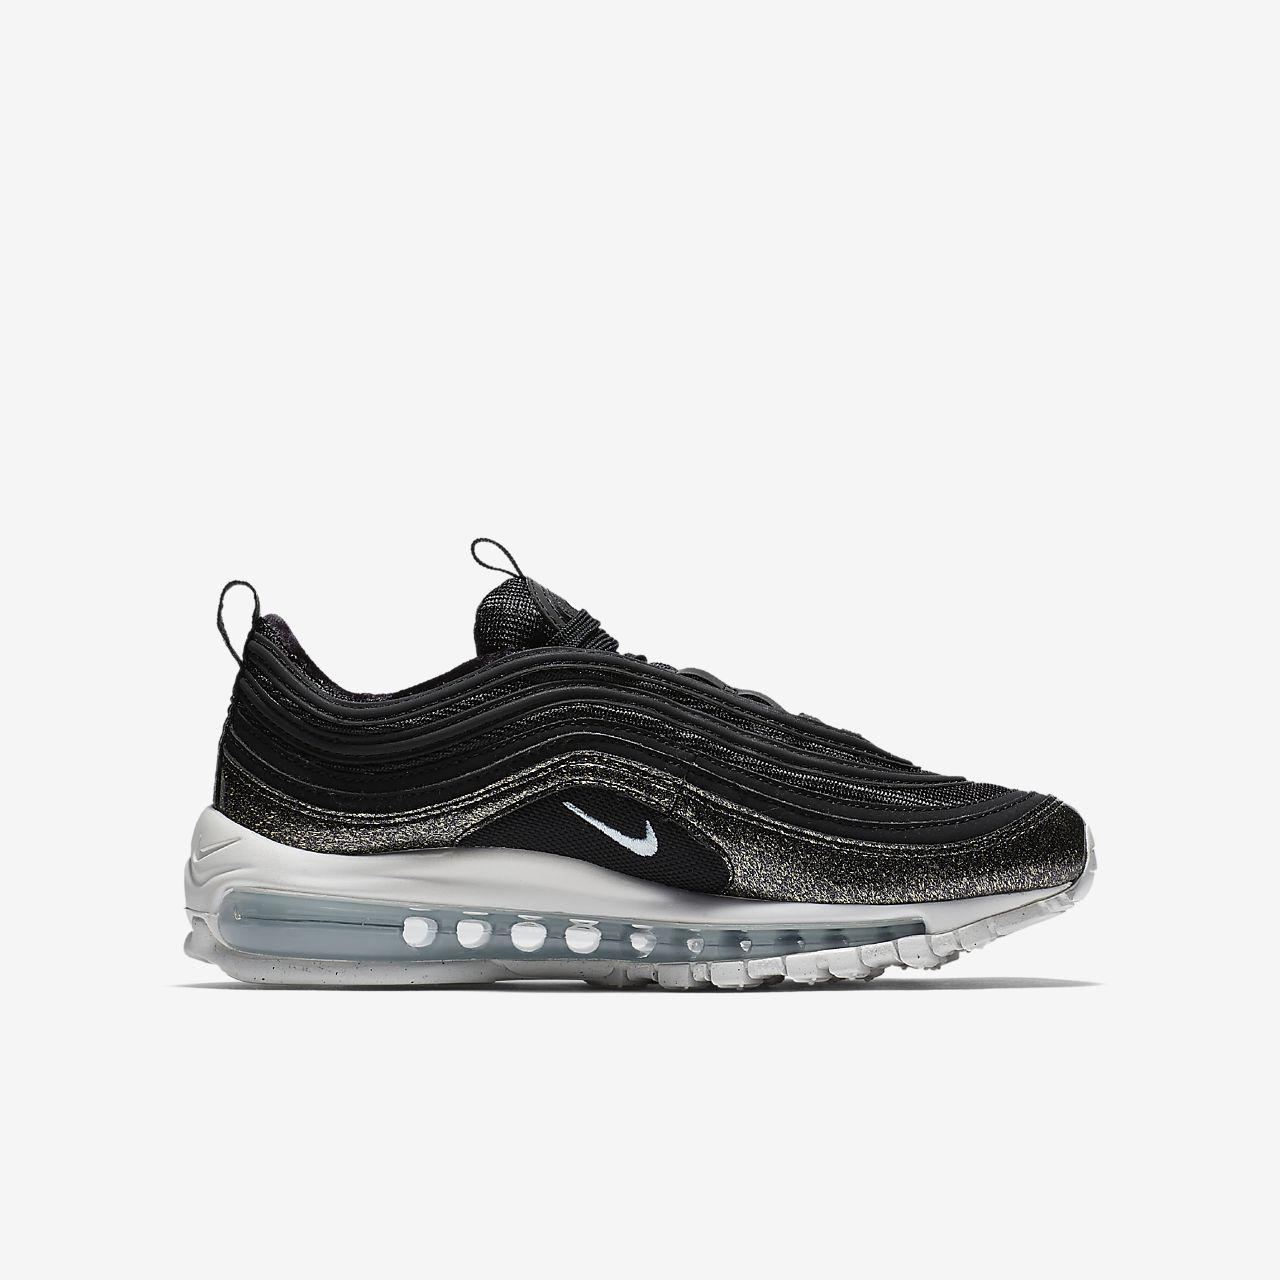 scarpe nike air max 97 bambino black